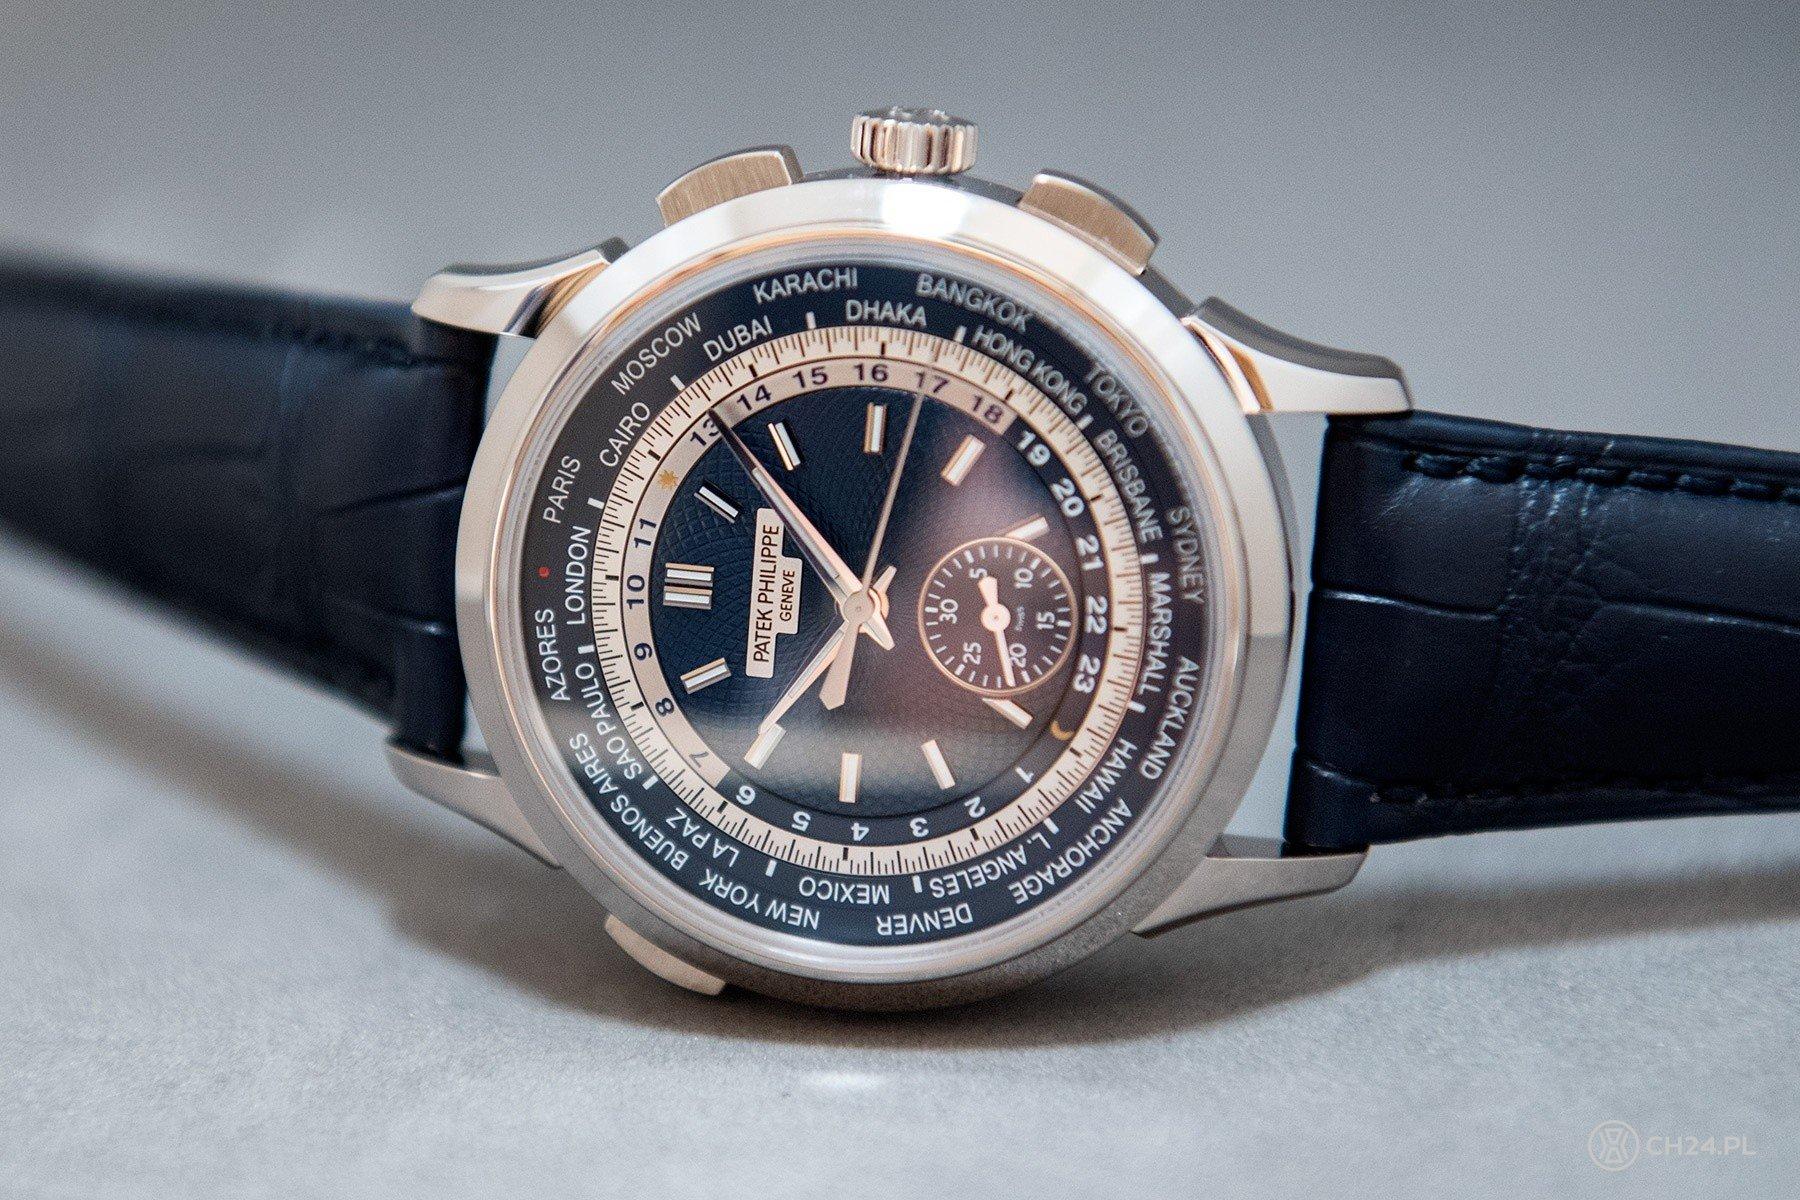 Patek Philippe World Time Chronograph Ref. 5930